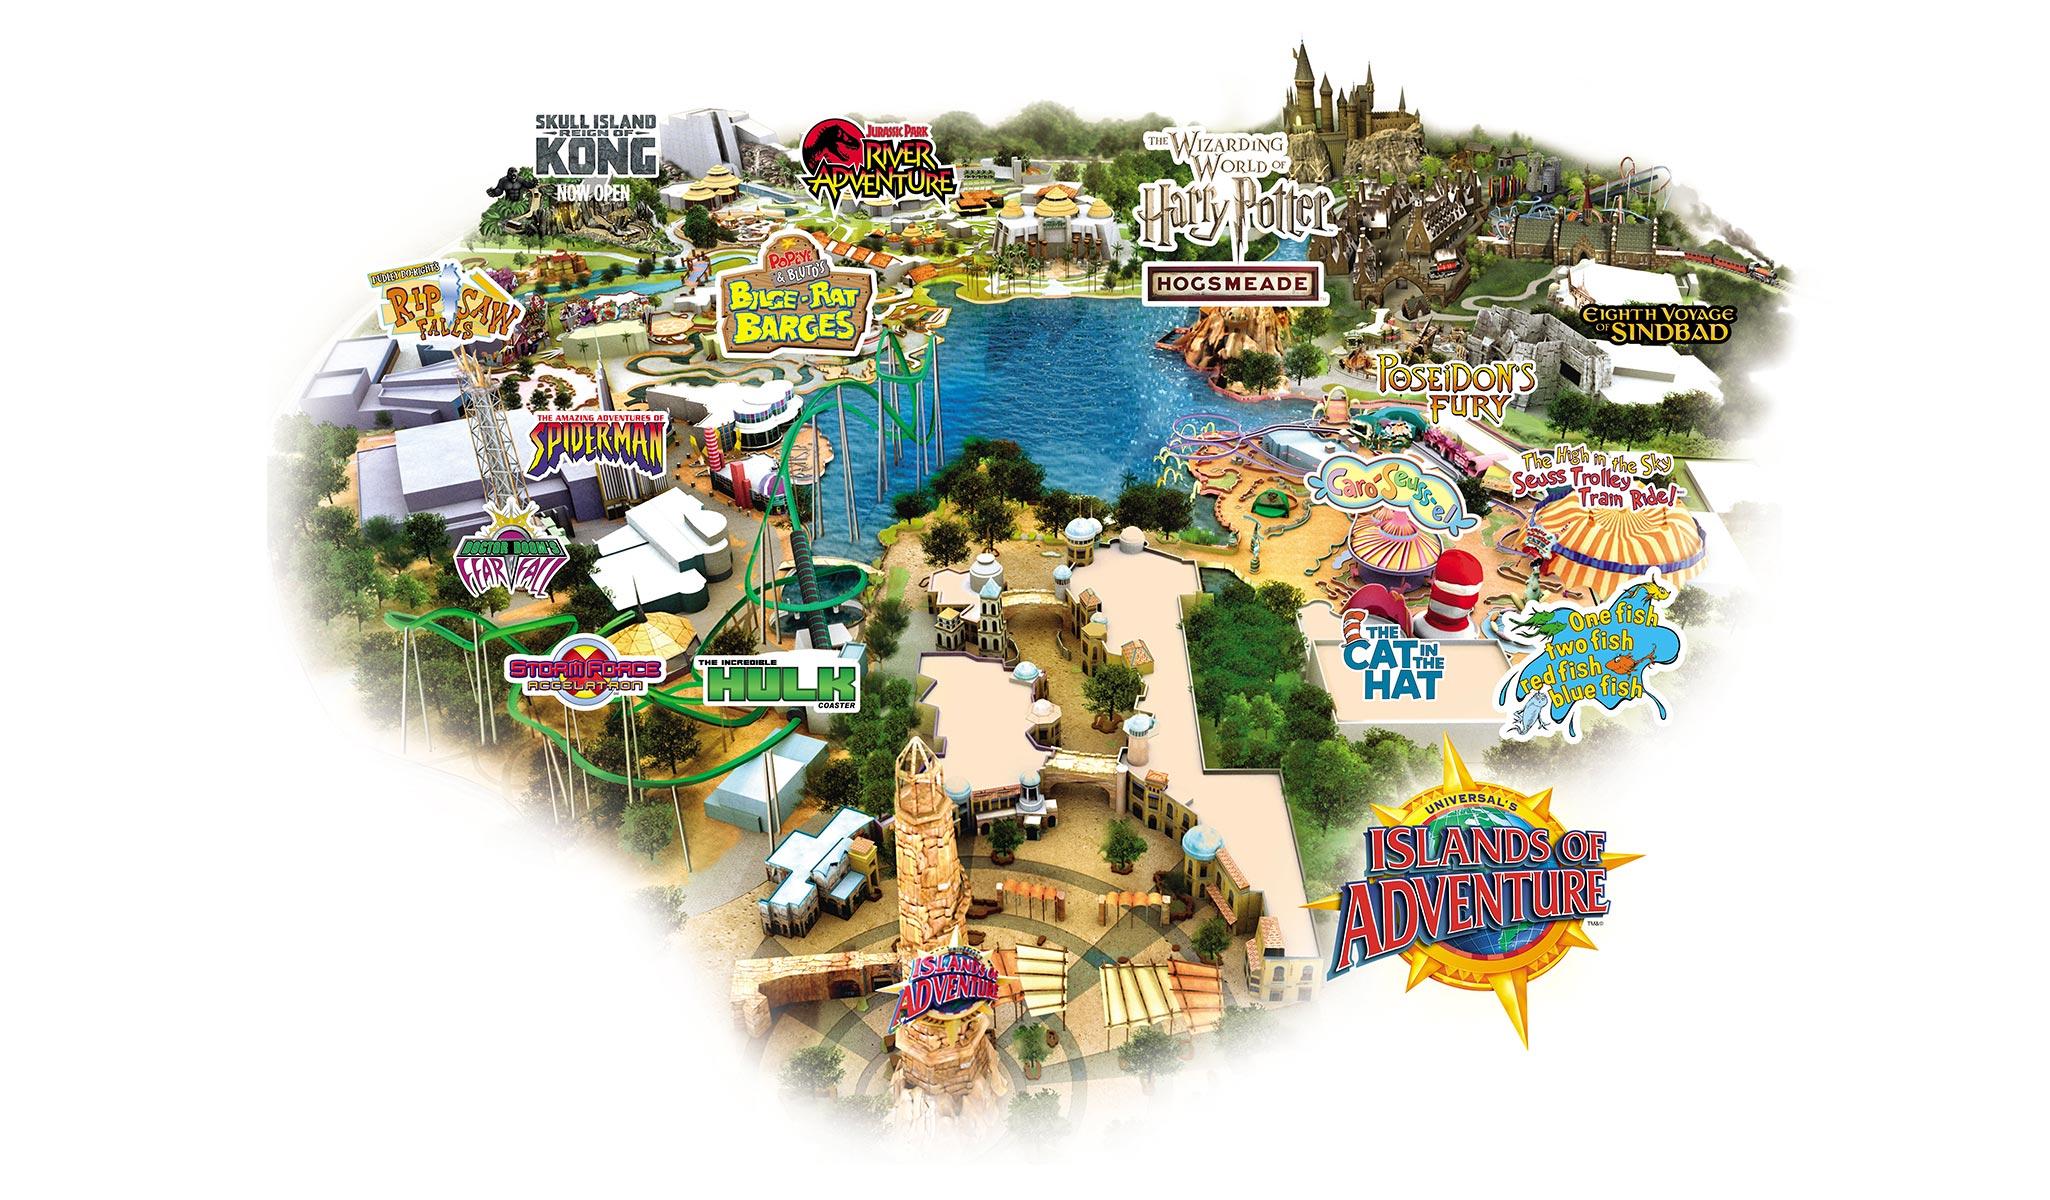 universal orlando resort packages  transat - see map